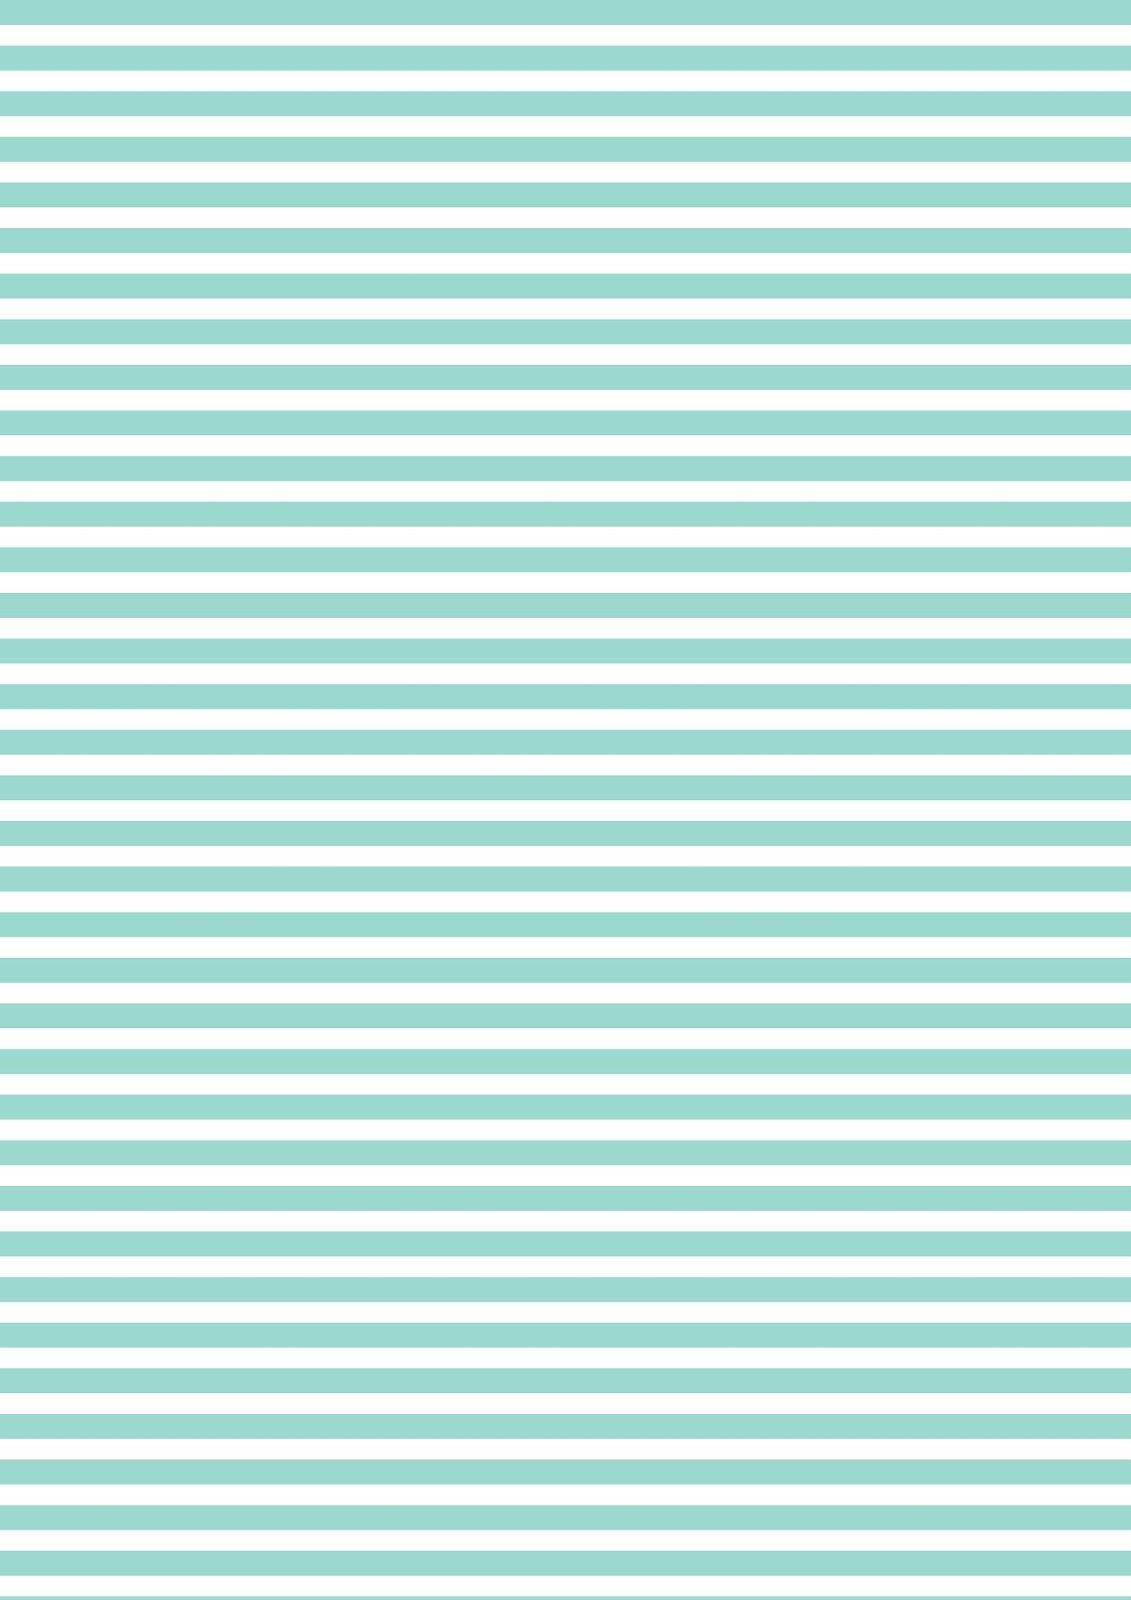 Free Printable Turquoise-White Striped Pattern Paper ^^ | Vert - Free Printable Patterns